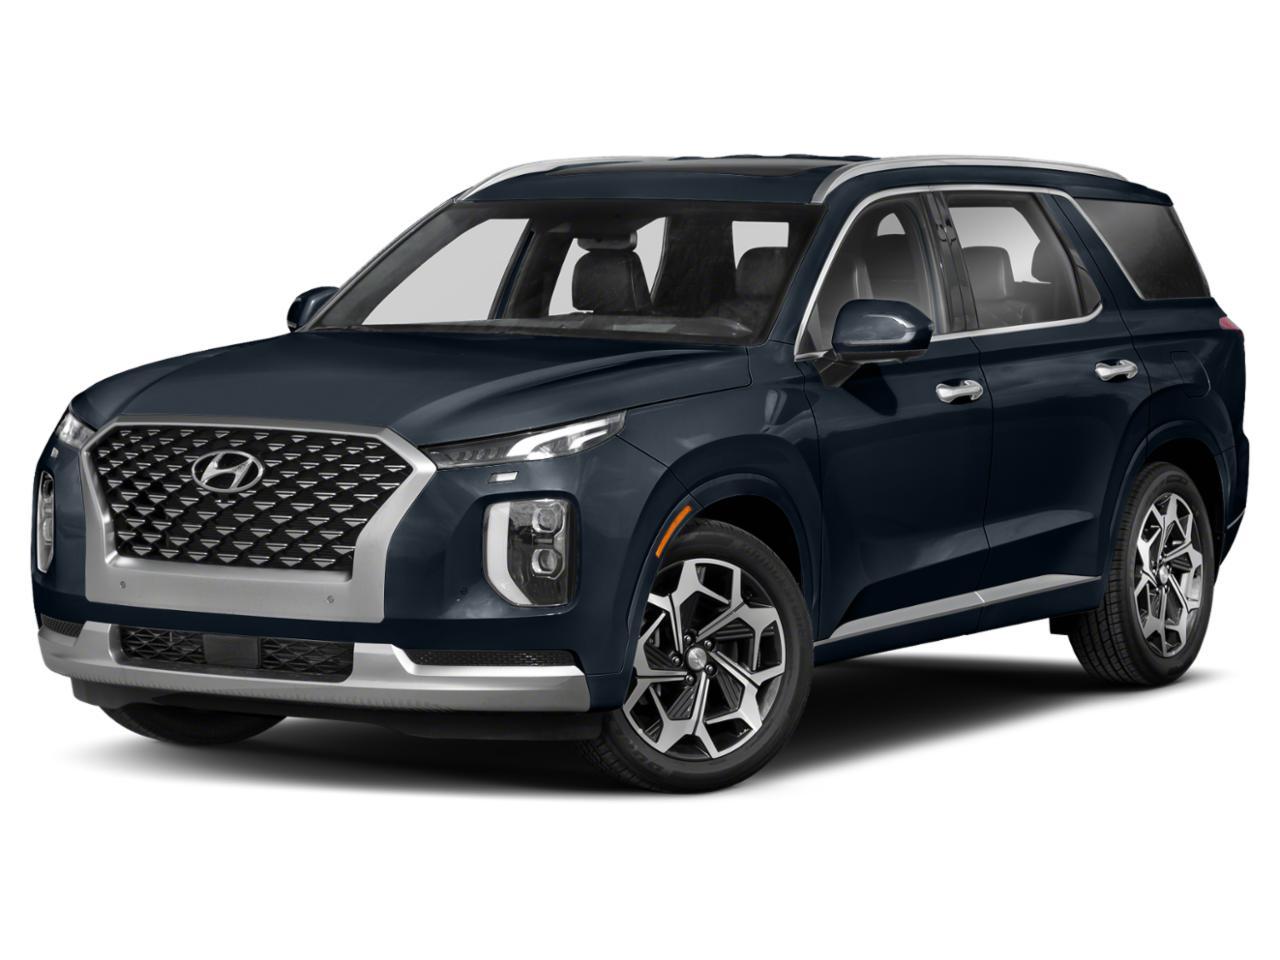 2022 Hyundai Palisade Vehicle Photo in O'Fallon, IL 62269